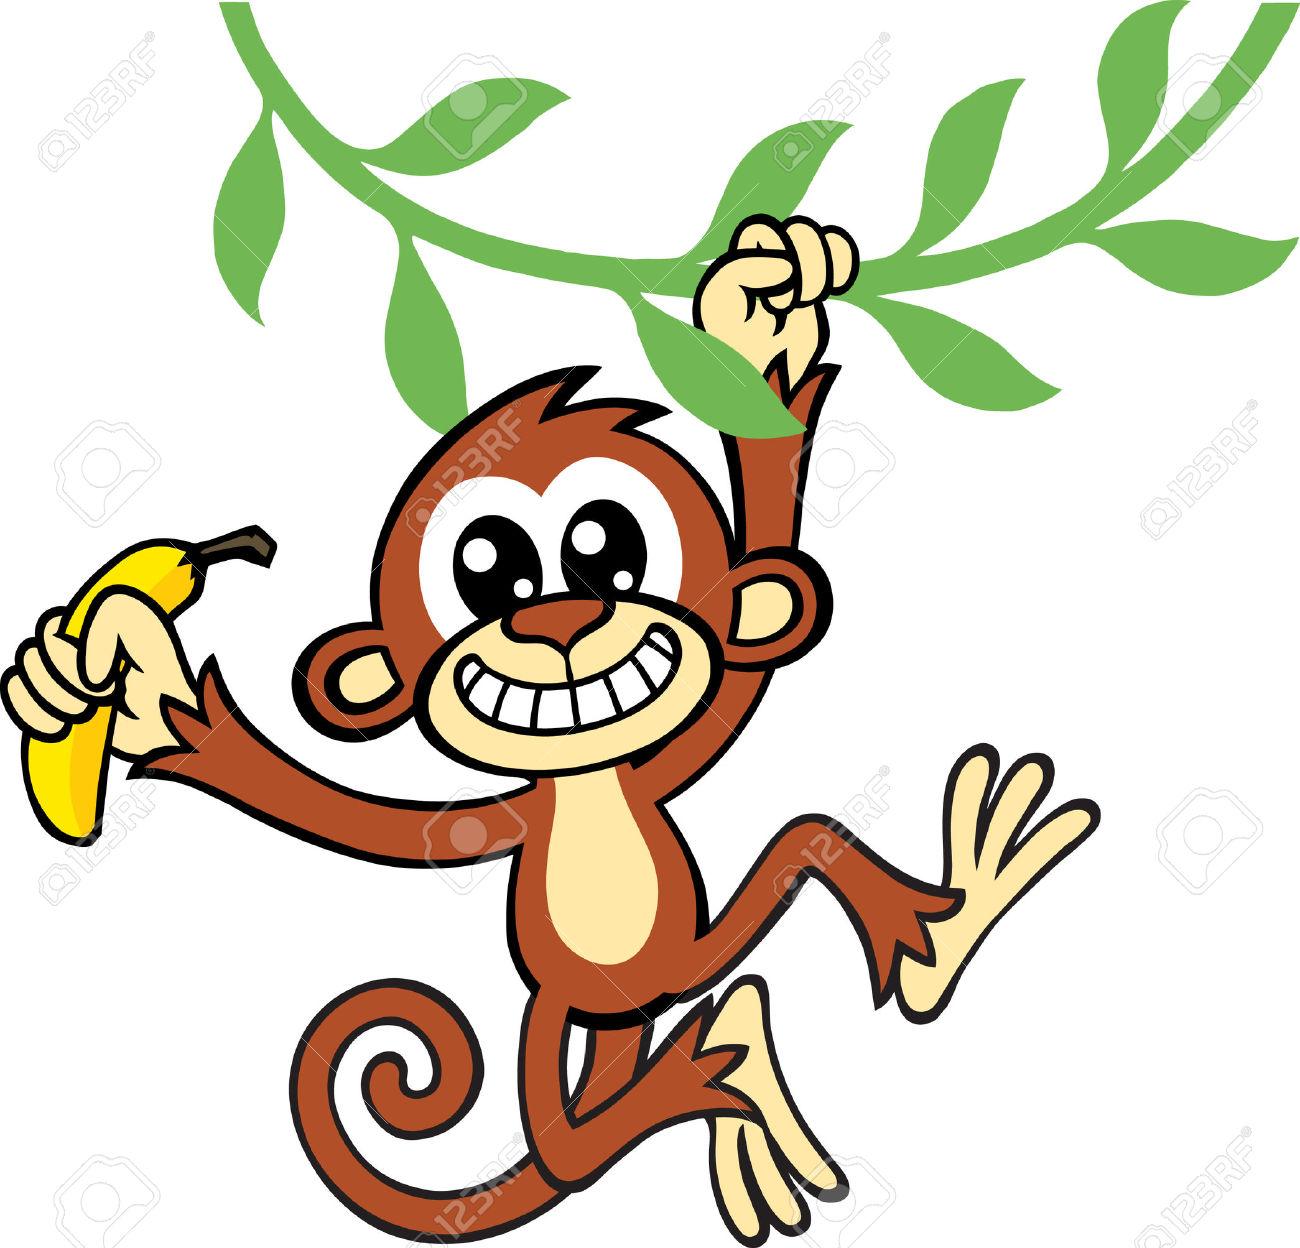 Free Clipart Monkey.